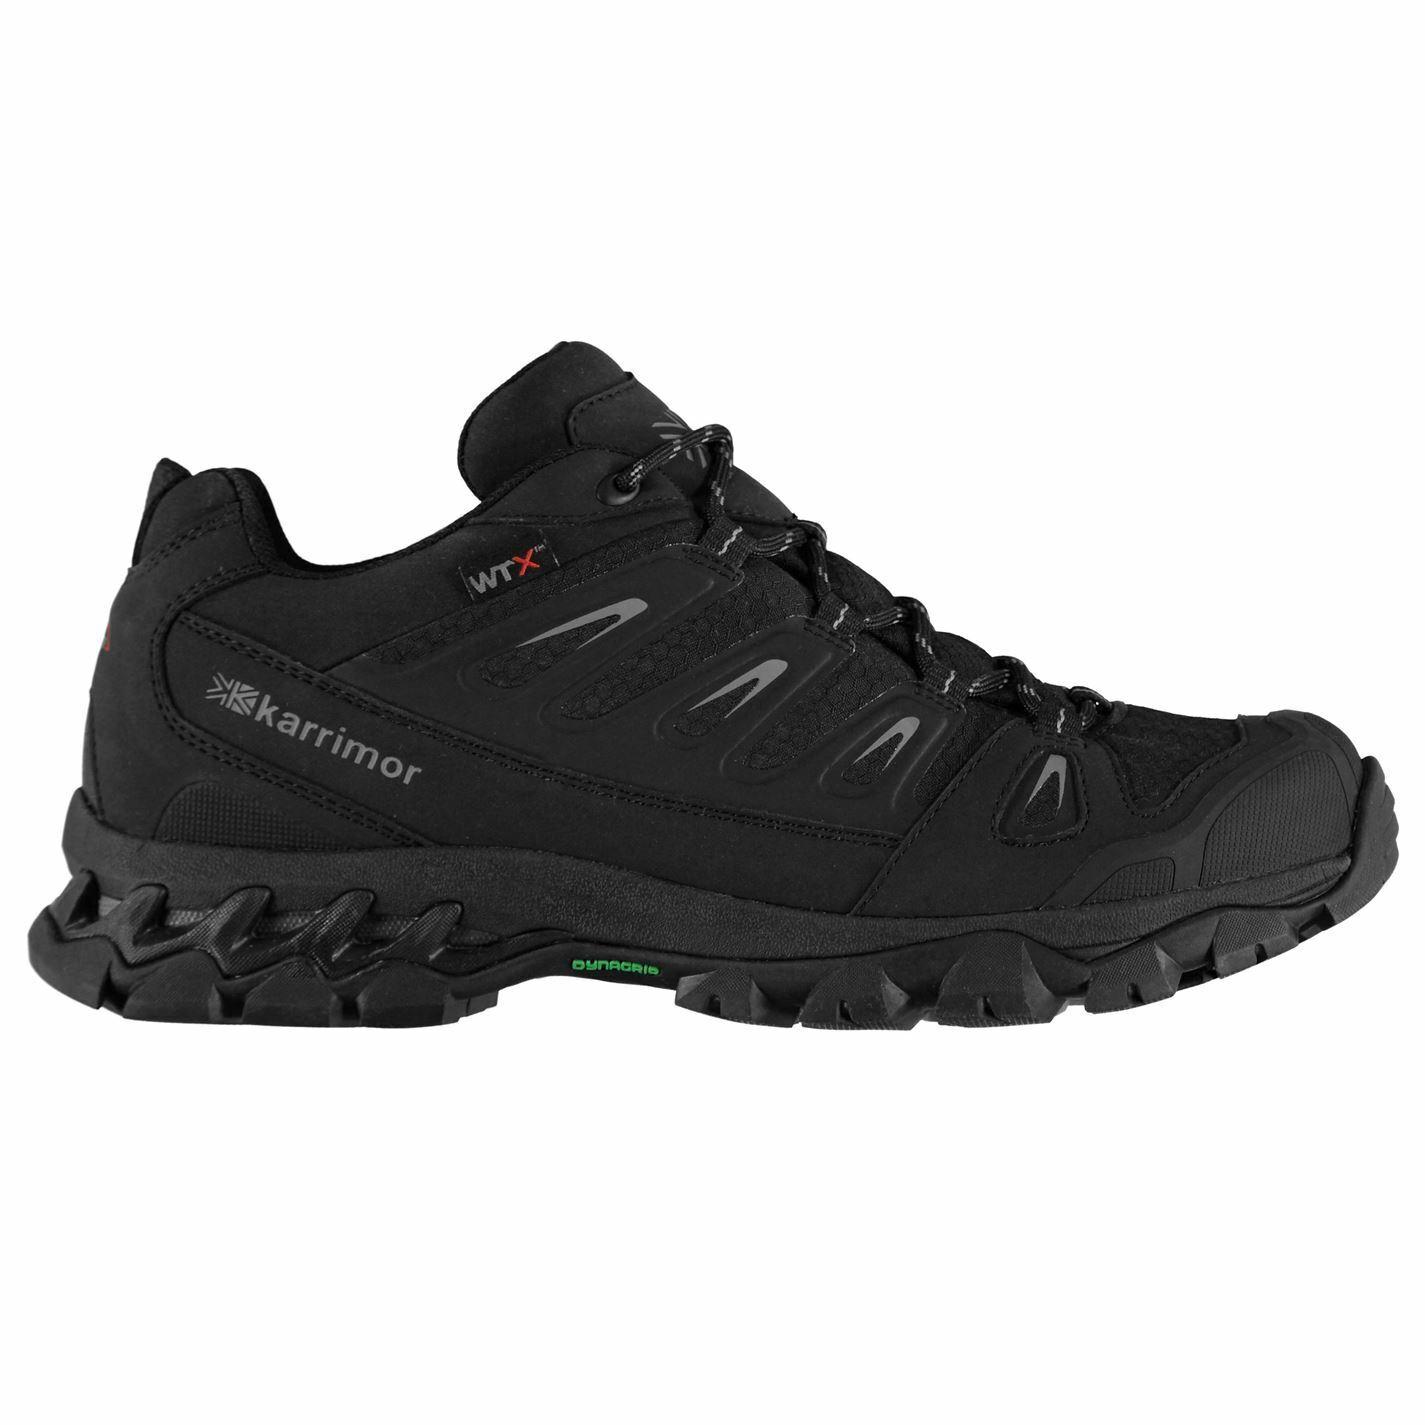 Karrimor Cougar Wtx Caminar Zapatos para hombre  Caballeros Cordones atados repelente al agua  últimos estilos